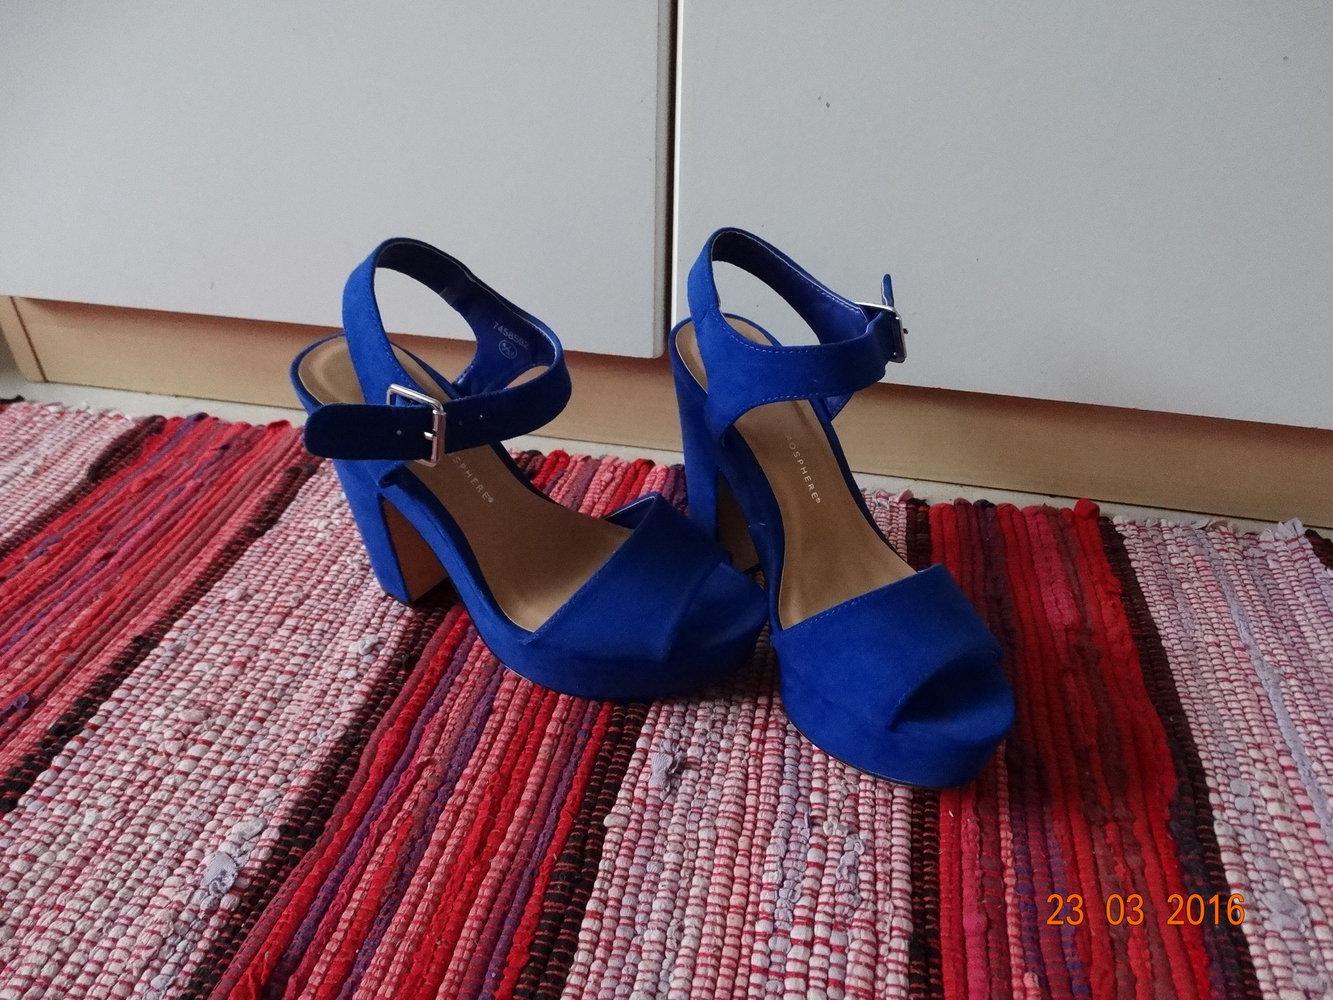 blaue blockabsatz high heels. Black Bedroom Furniture Sets. Home Design Ideas